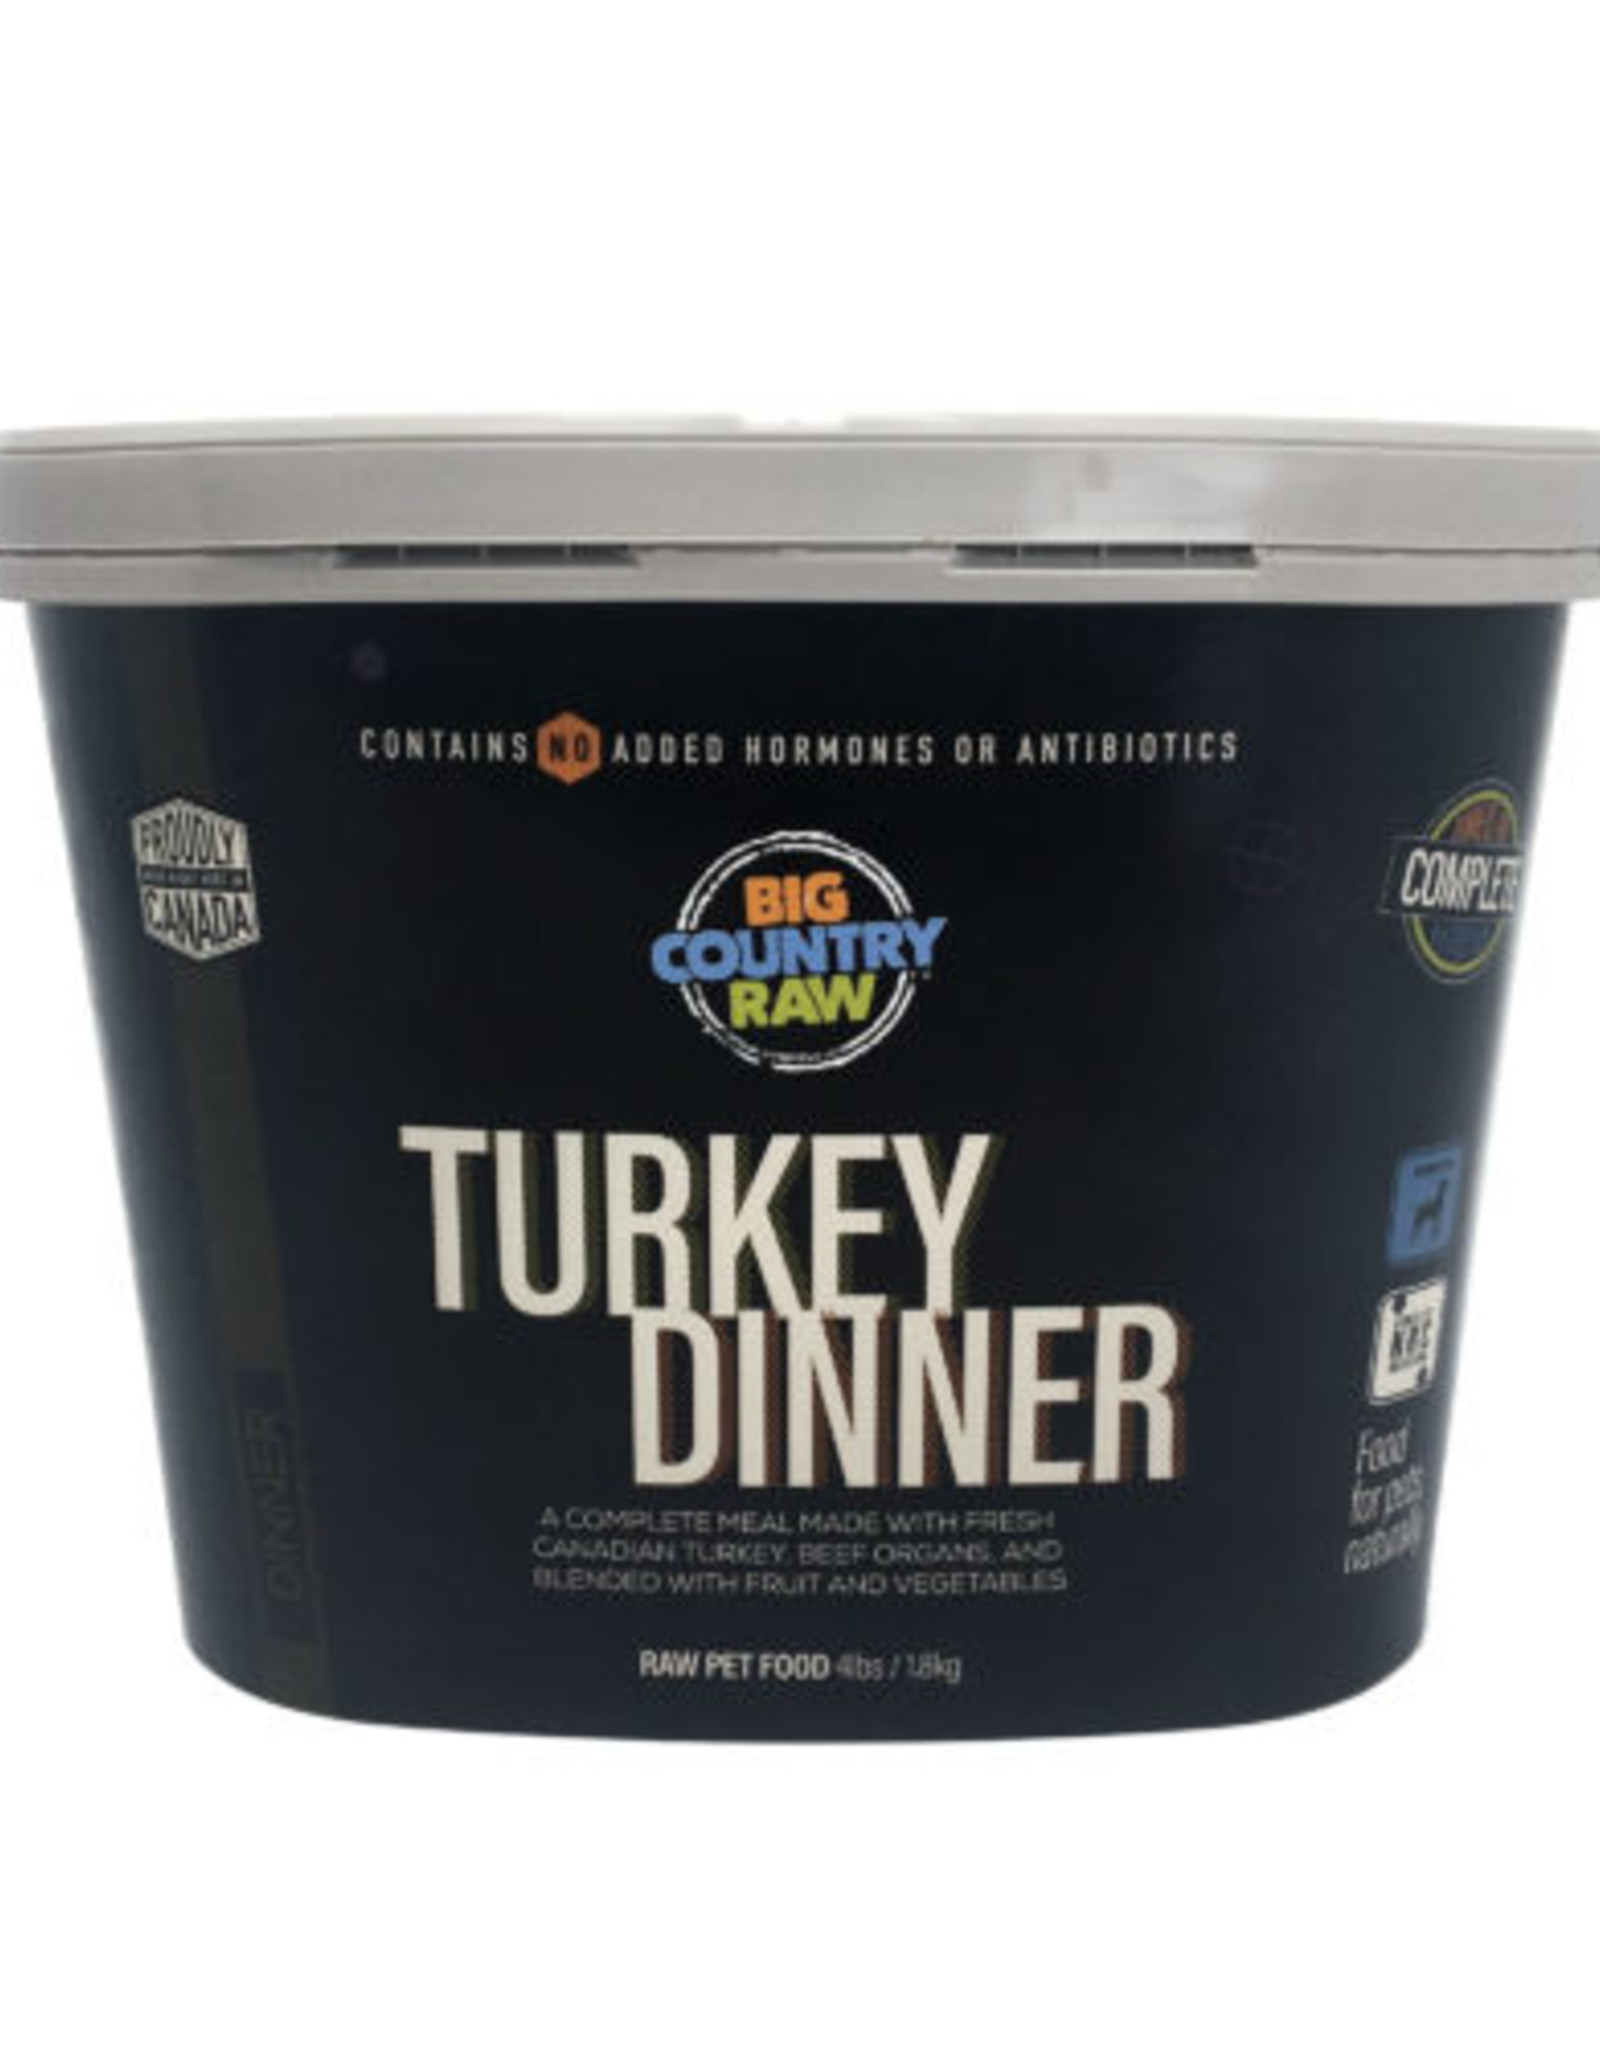 Big Country Raw Big Country Raw Turkey Dinner Tub 4lbs